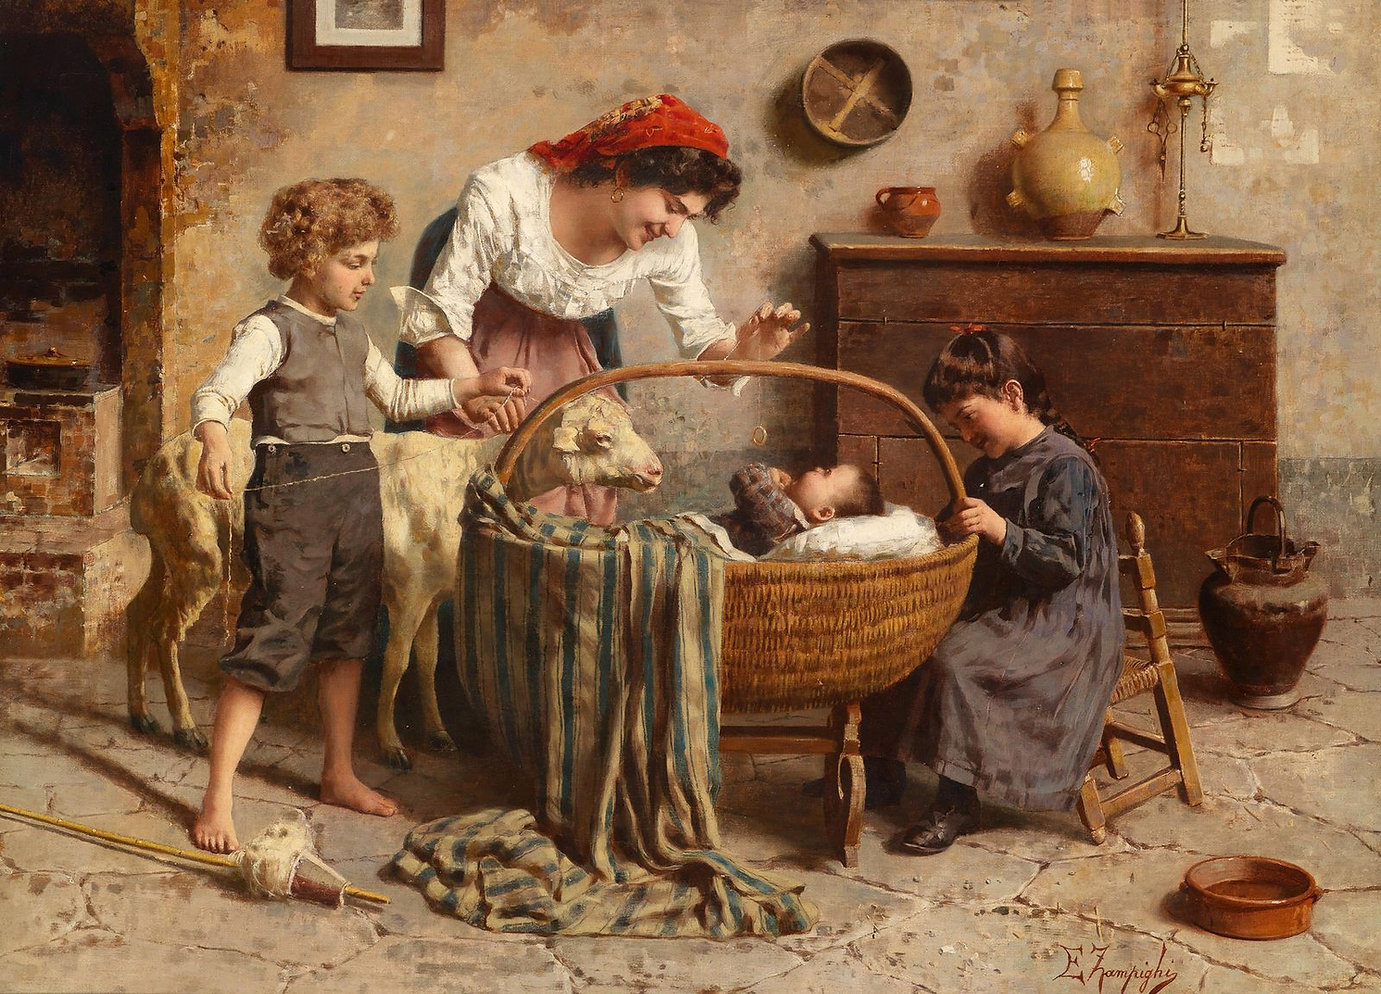 Eugenio_Zampighi_-_Idyllic_Family_Scene_